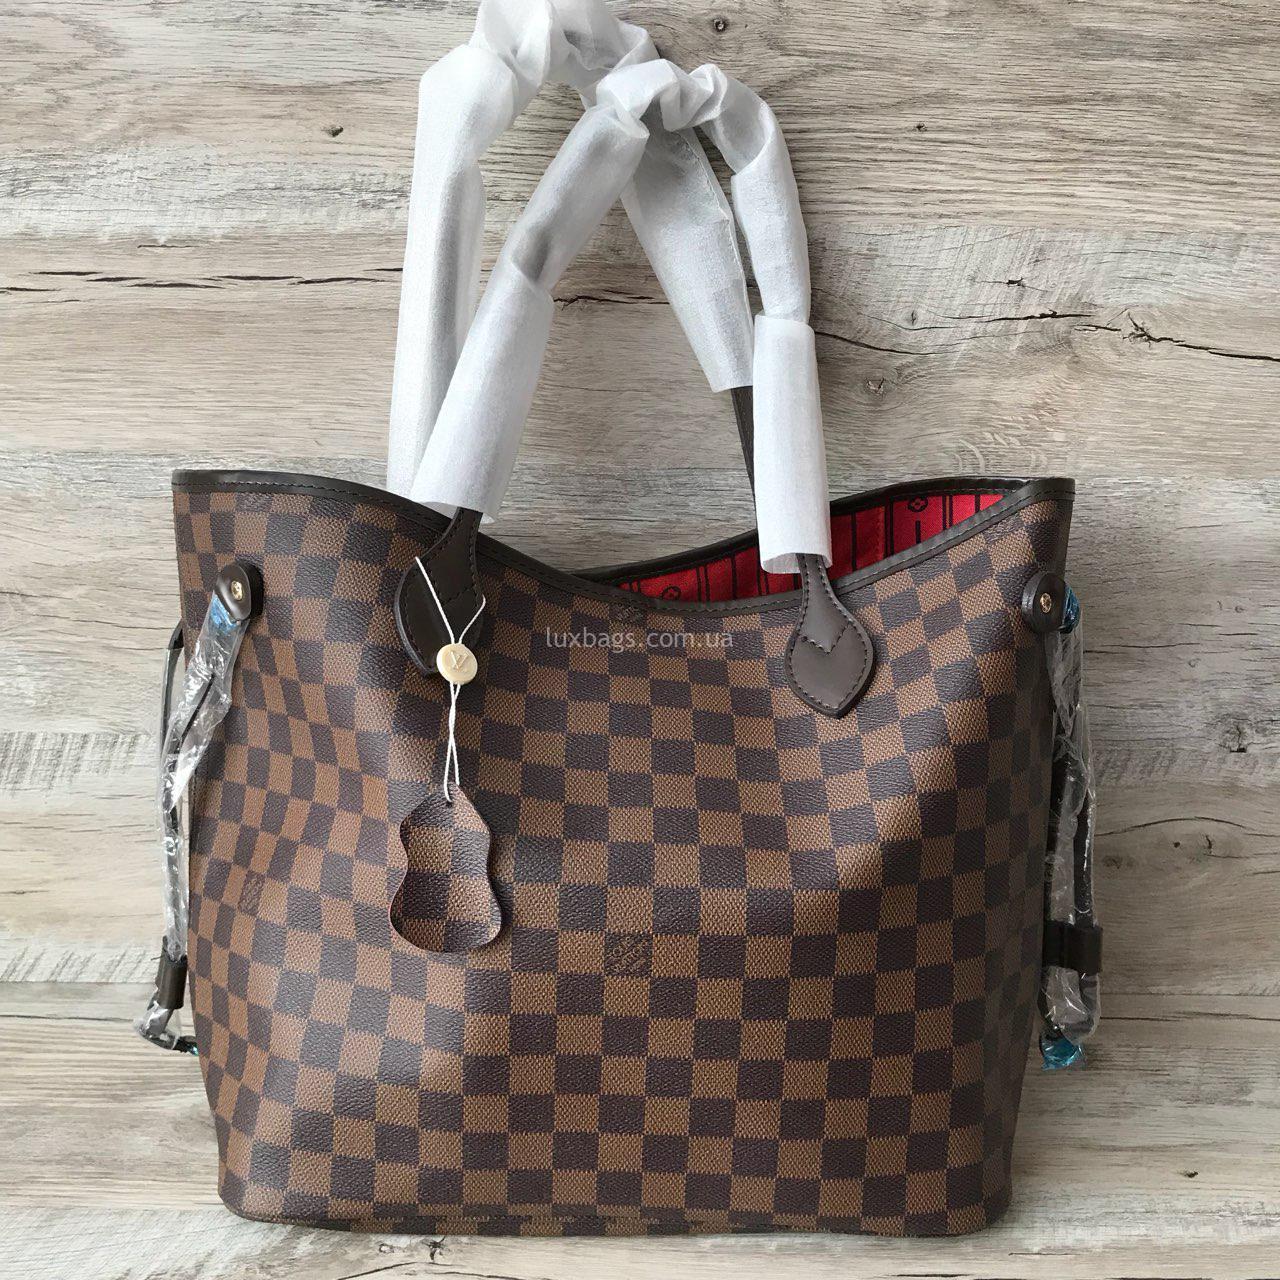 27740283c6f5 Женская сумка Louis Vuitton Neverfull Купить на lux-bags